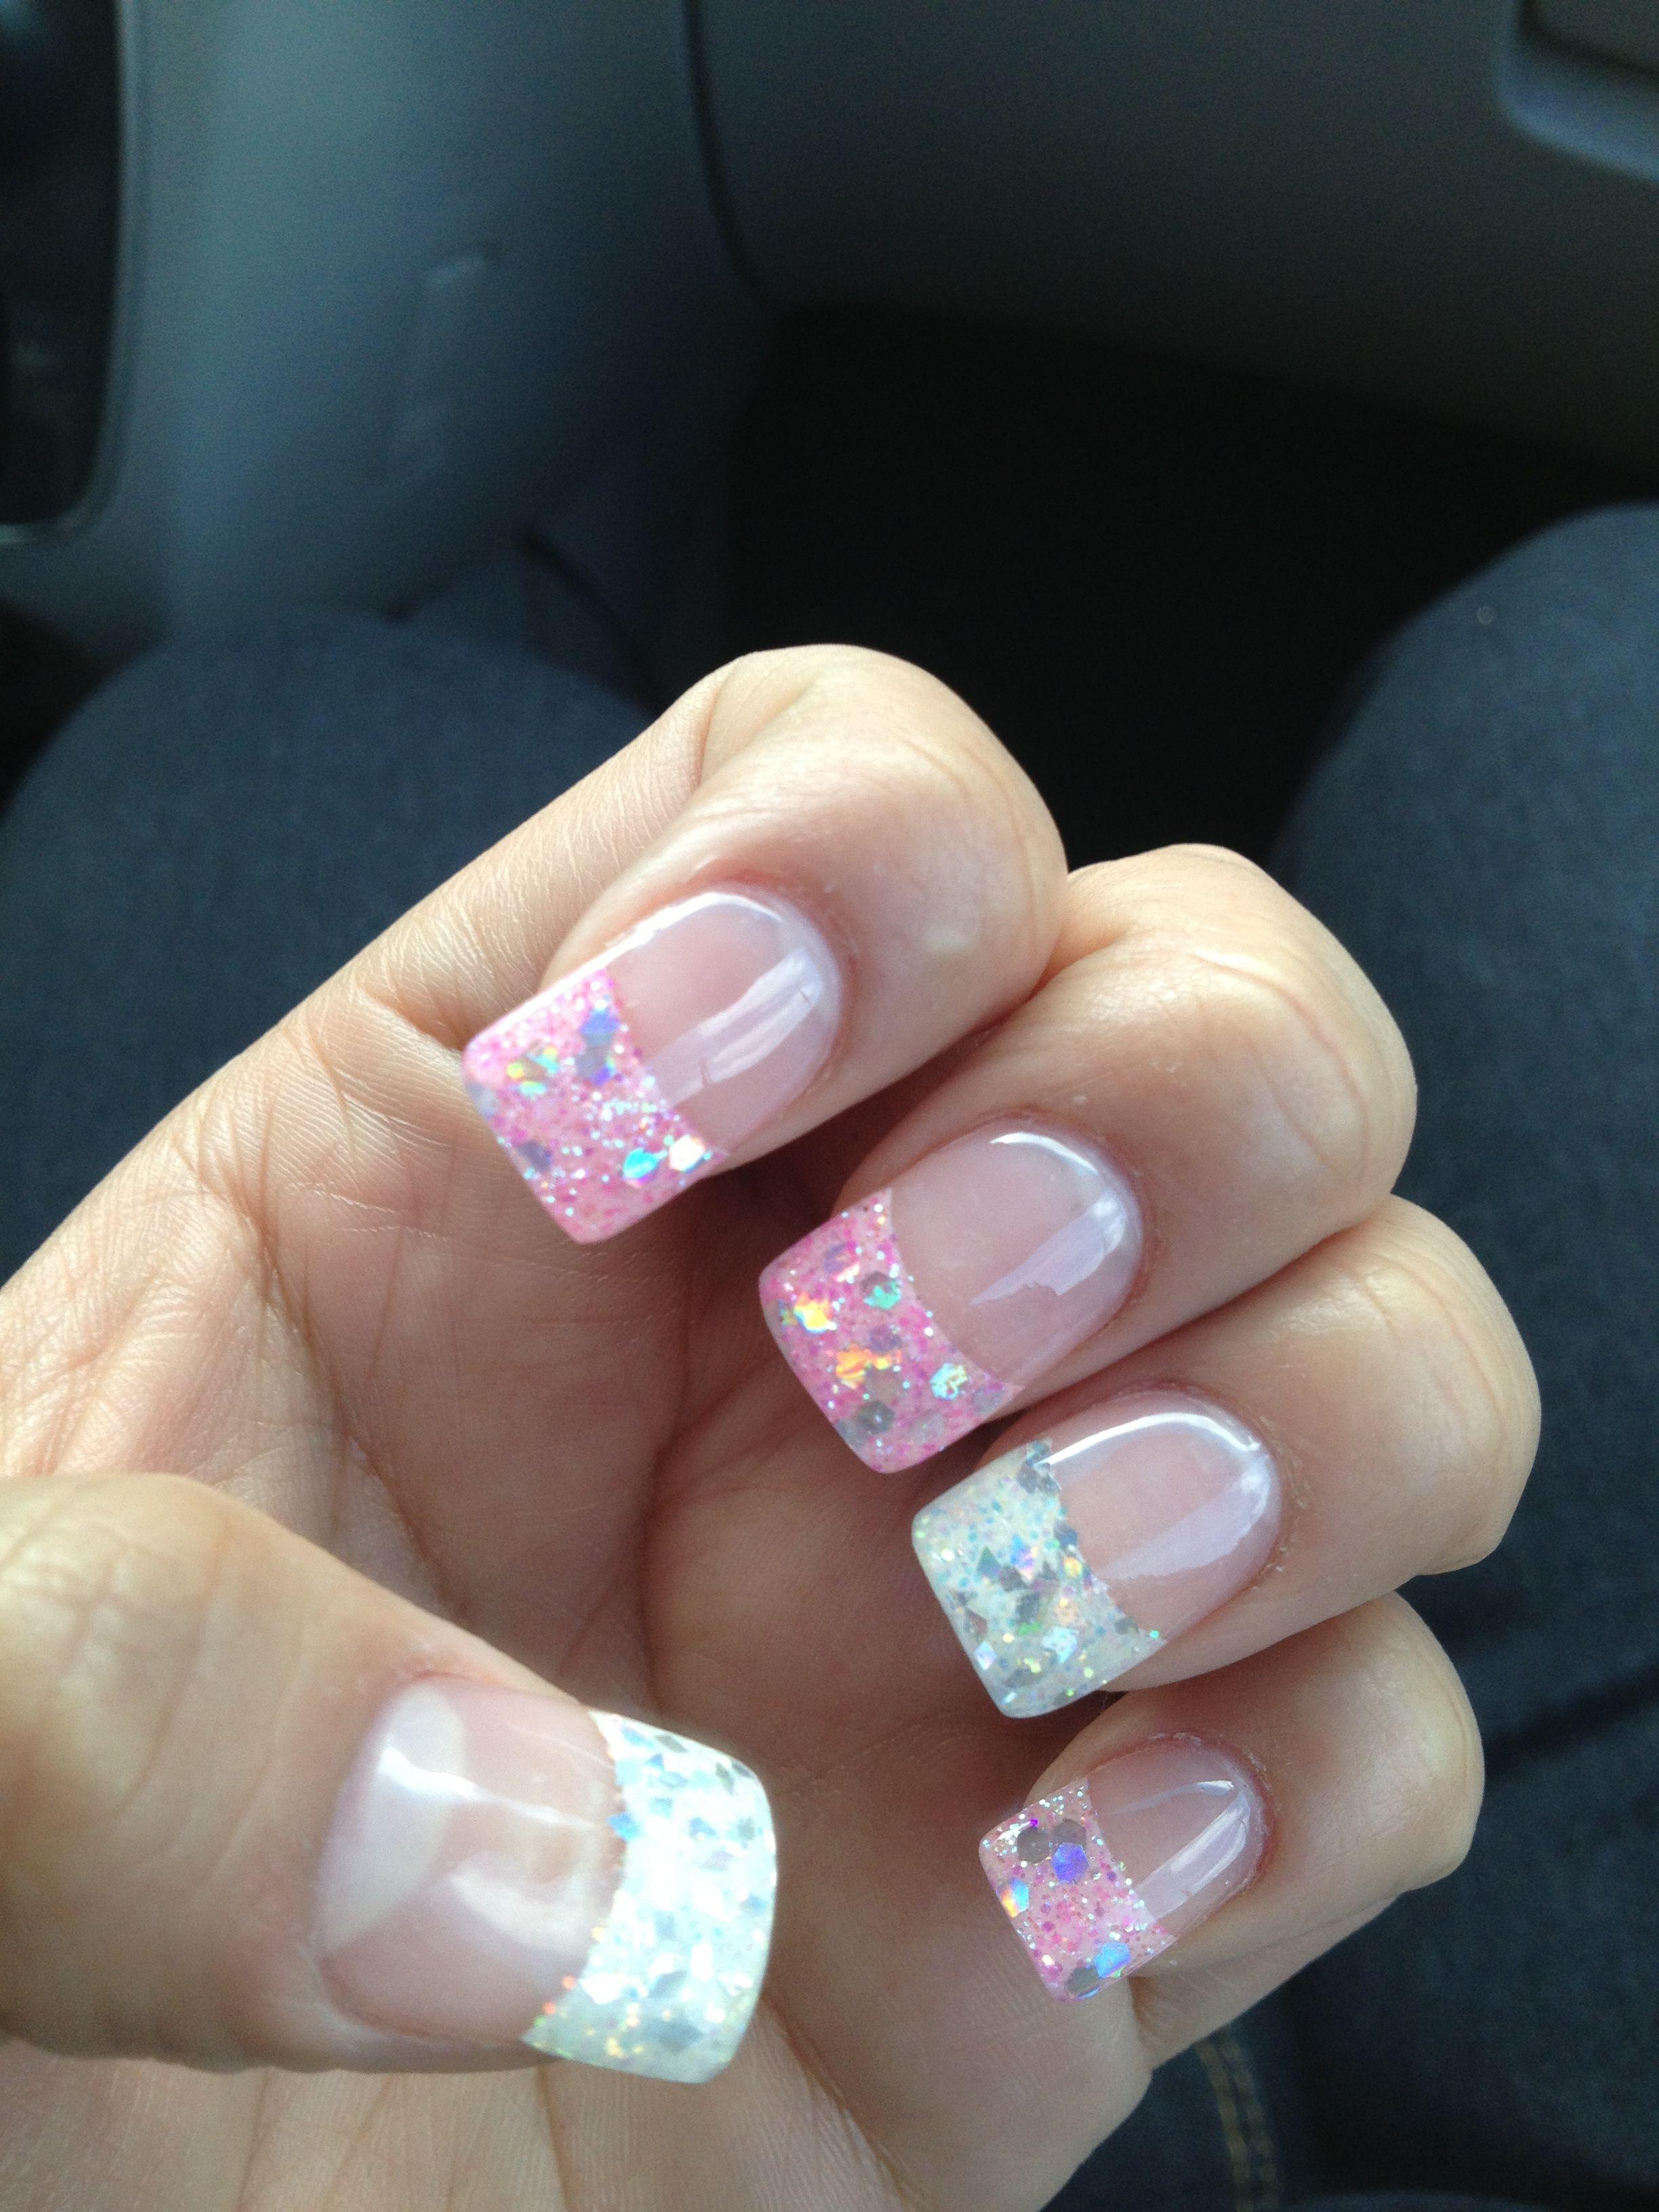 ♥Glitter nail tips Babypink and white♥ | nails | Pinterest